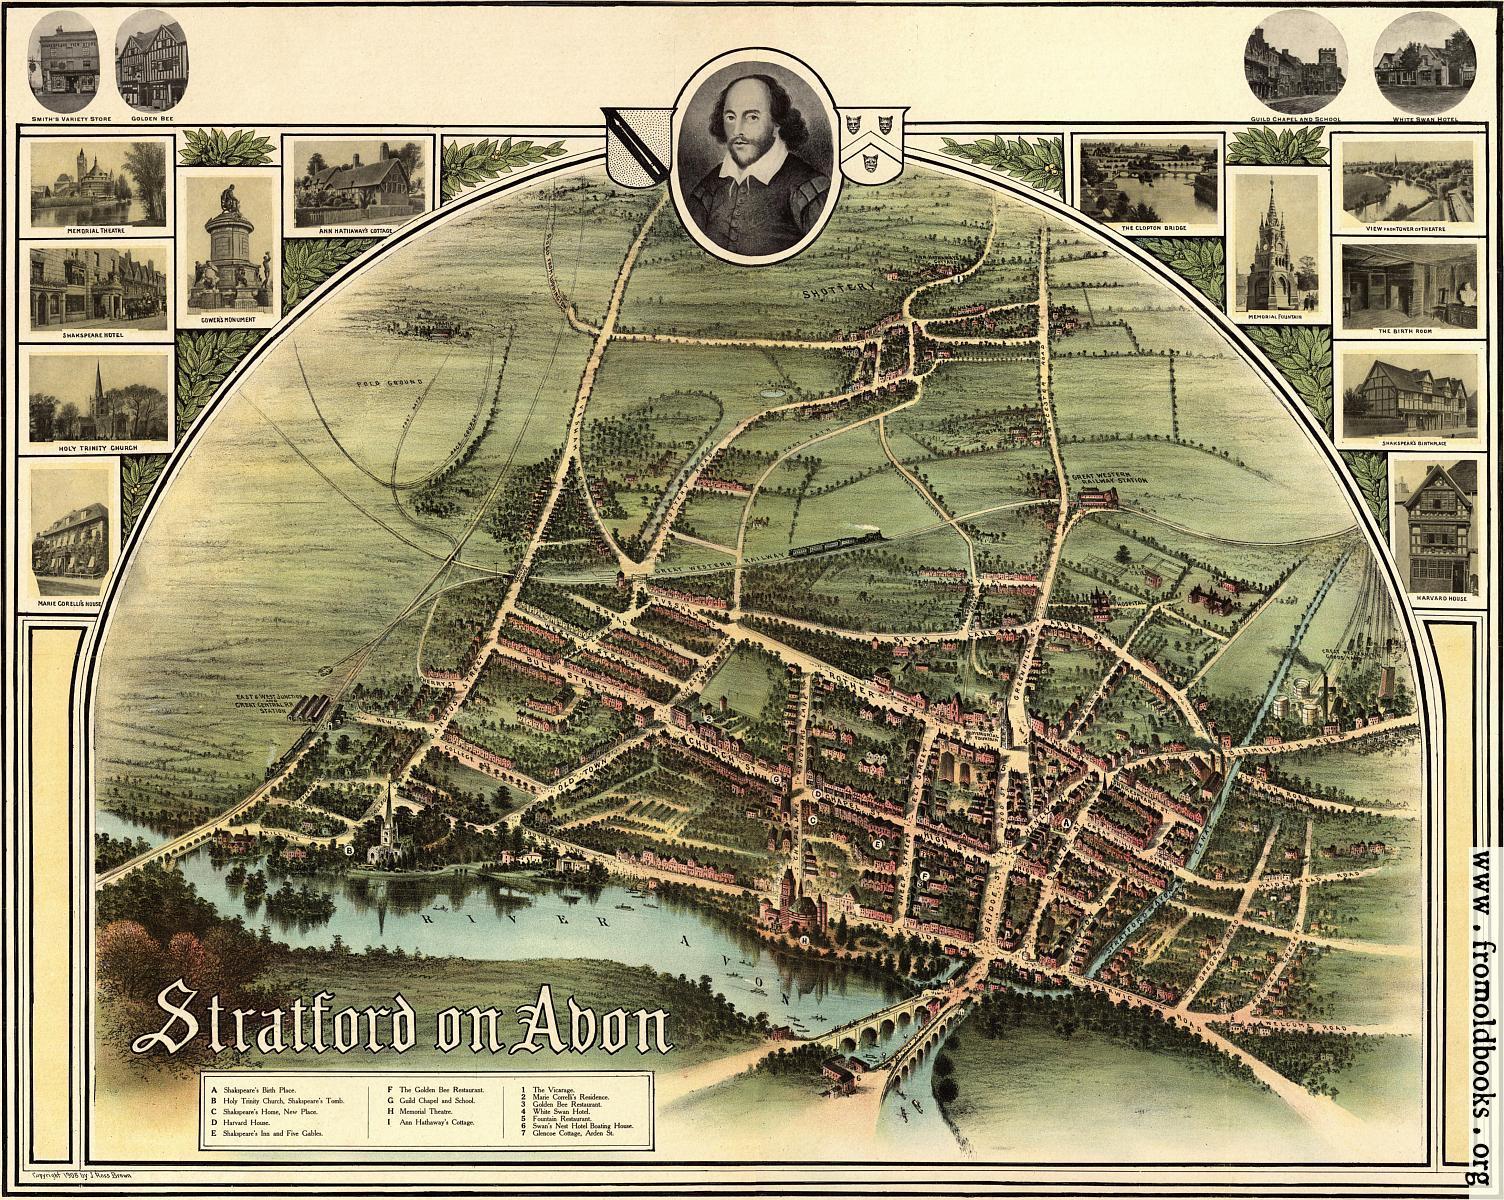 Stratford on avon 1504x1200 522k jpg free download gumiabroncs Image collections